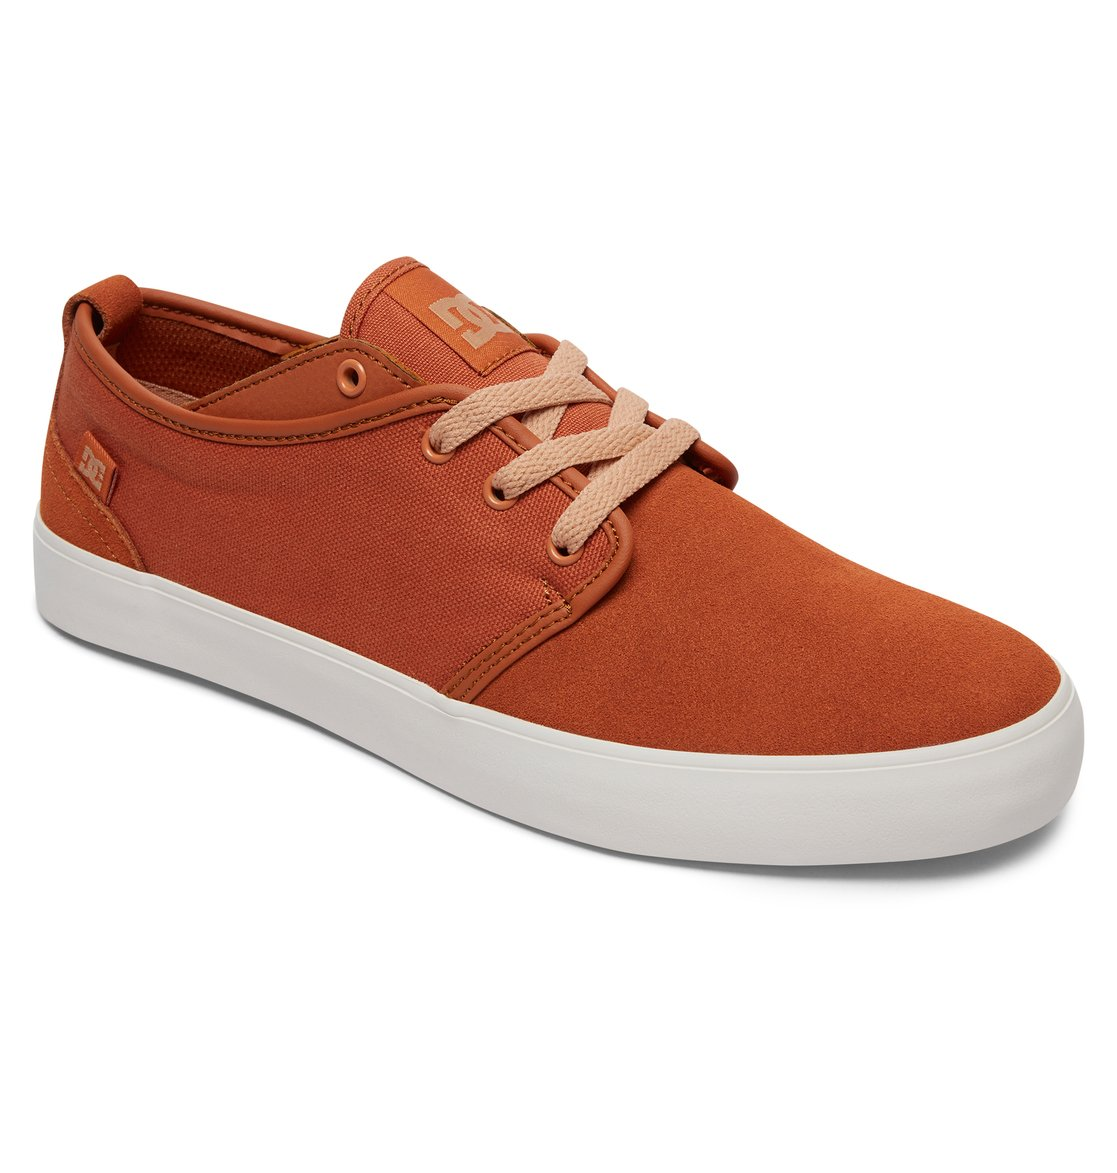 Zapatos marrones DC Shoes Kremer para hombre Pfl7X2XXz